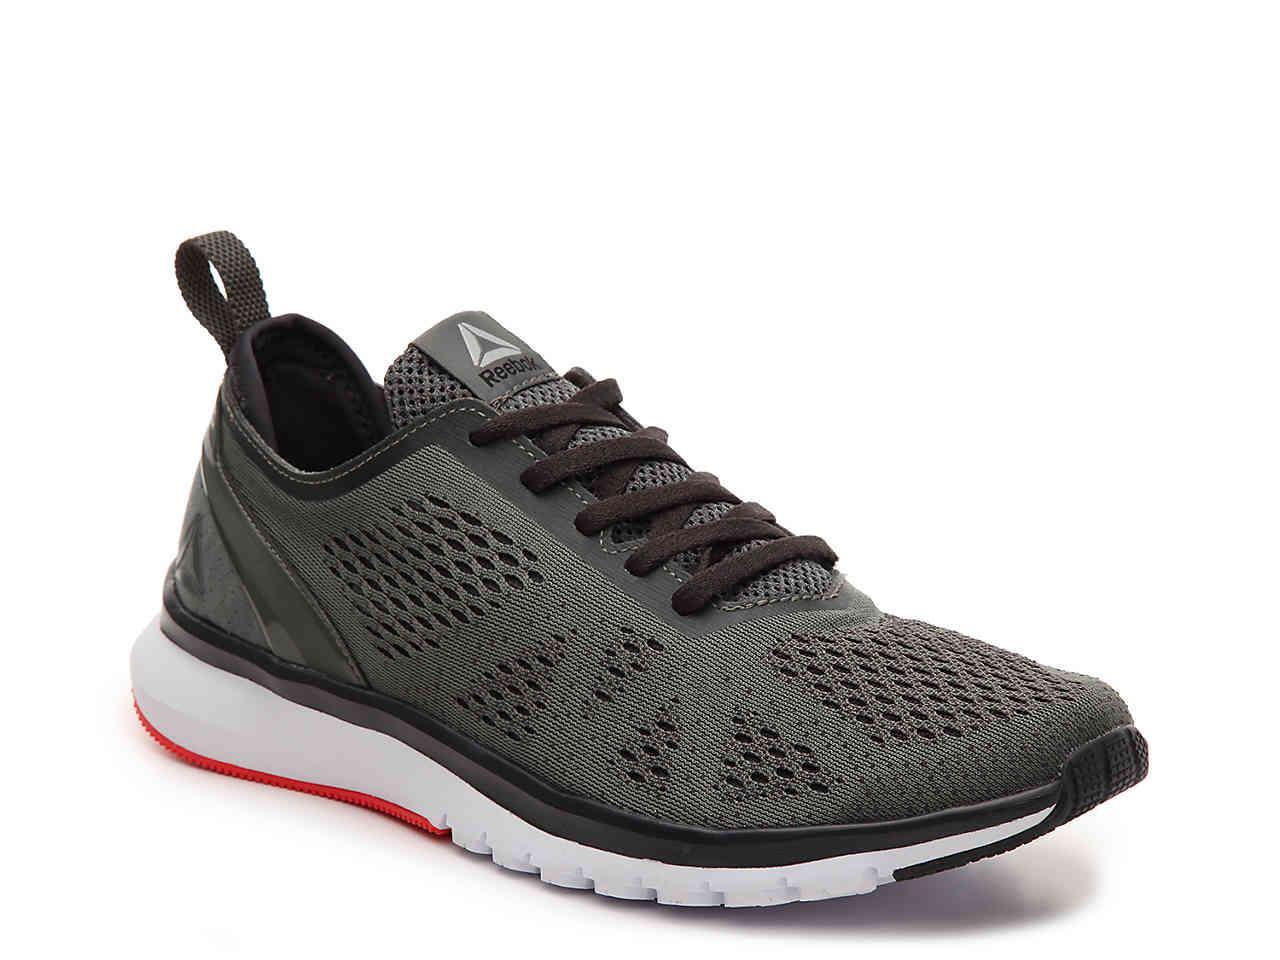 Lyst - Reebok Zprint Run Smooth Lightweight Running Shoe in Black ... 4426bf526